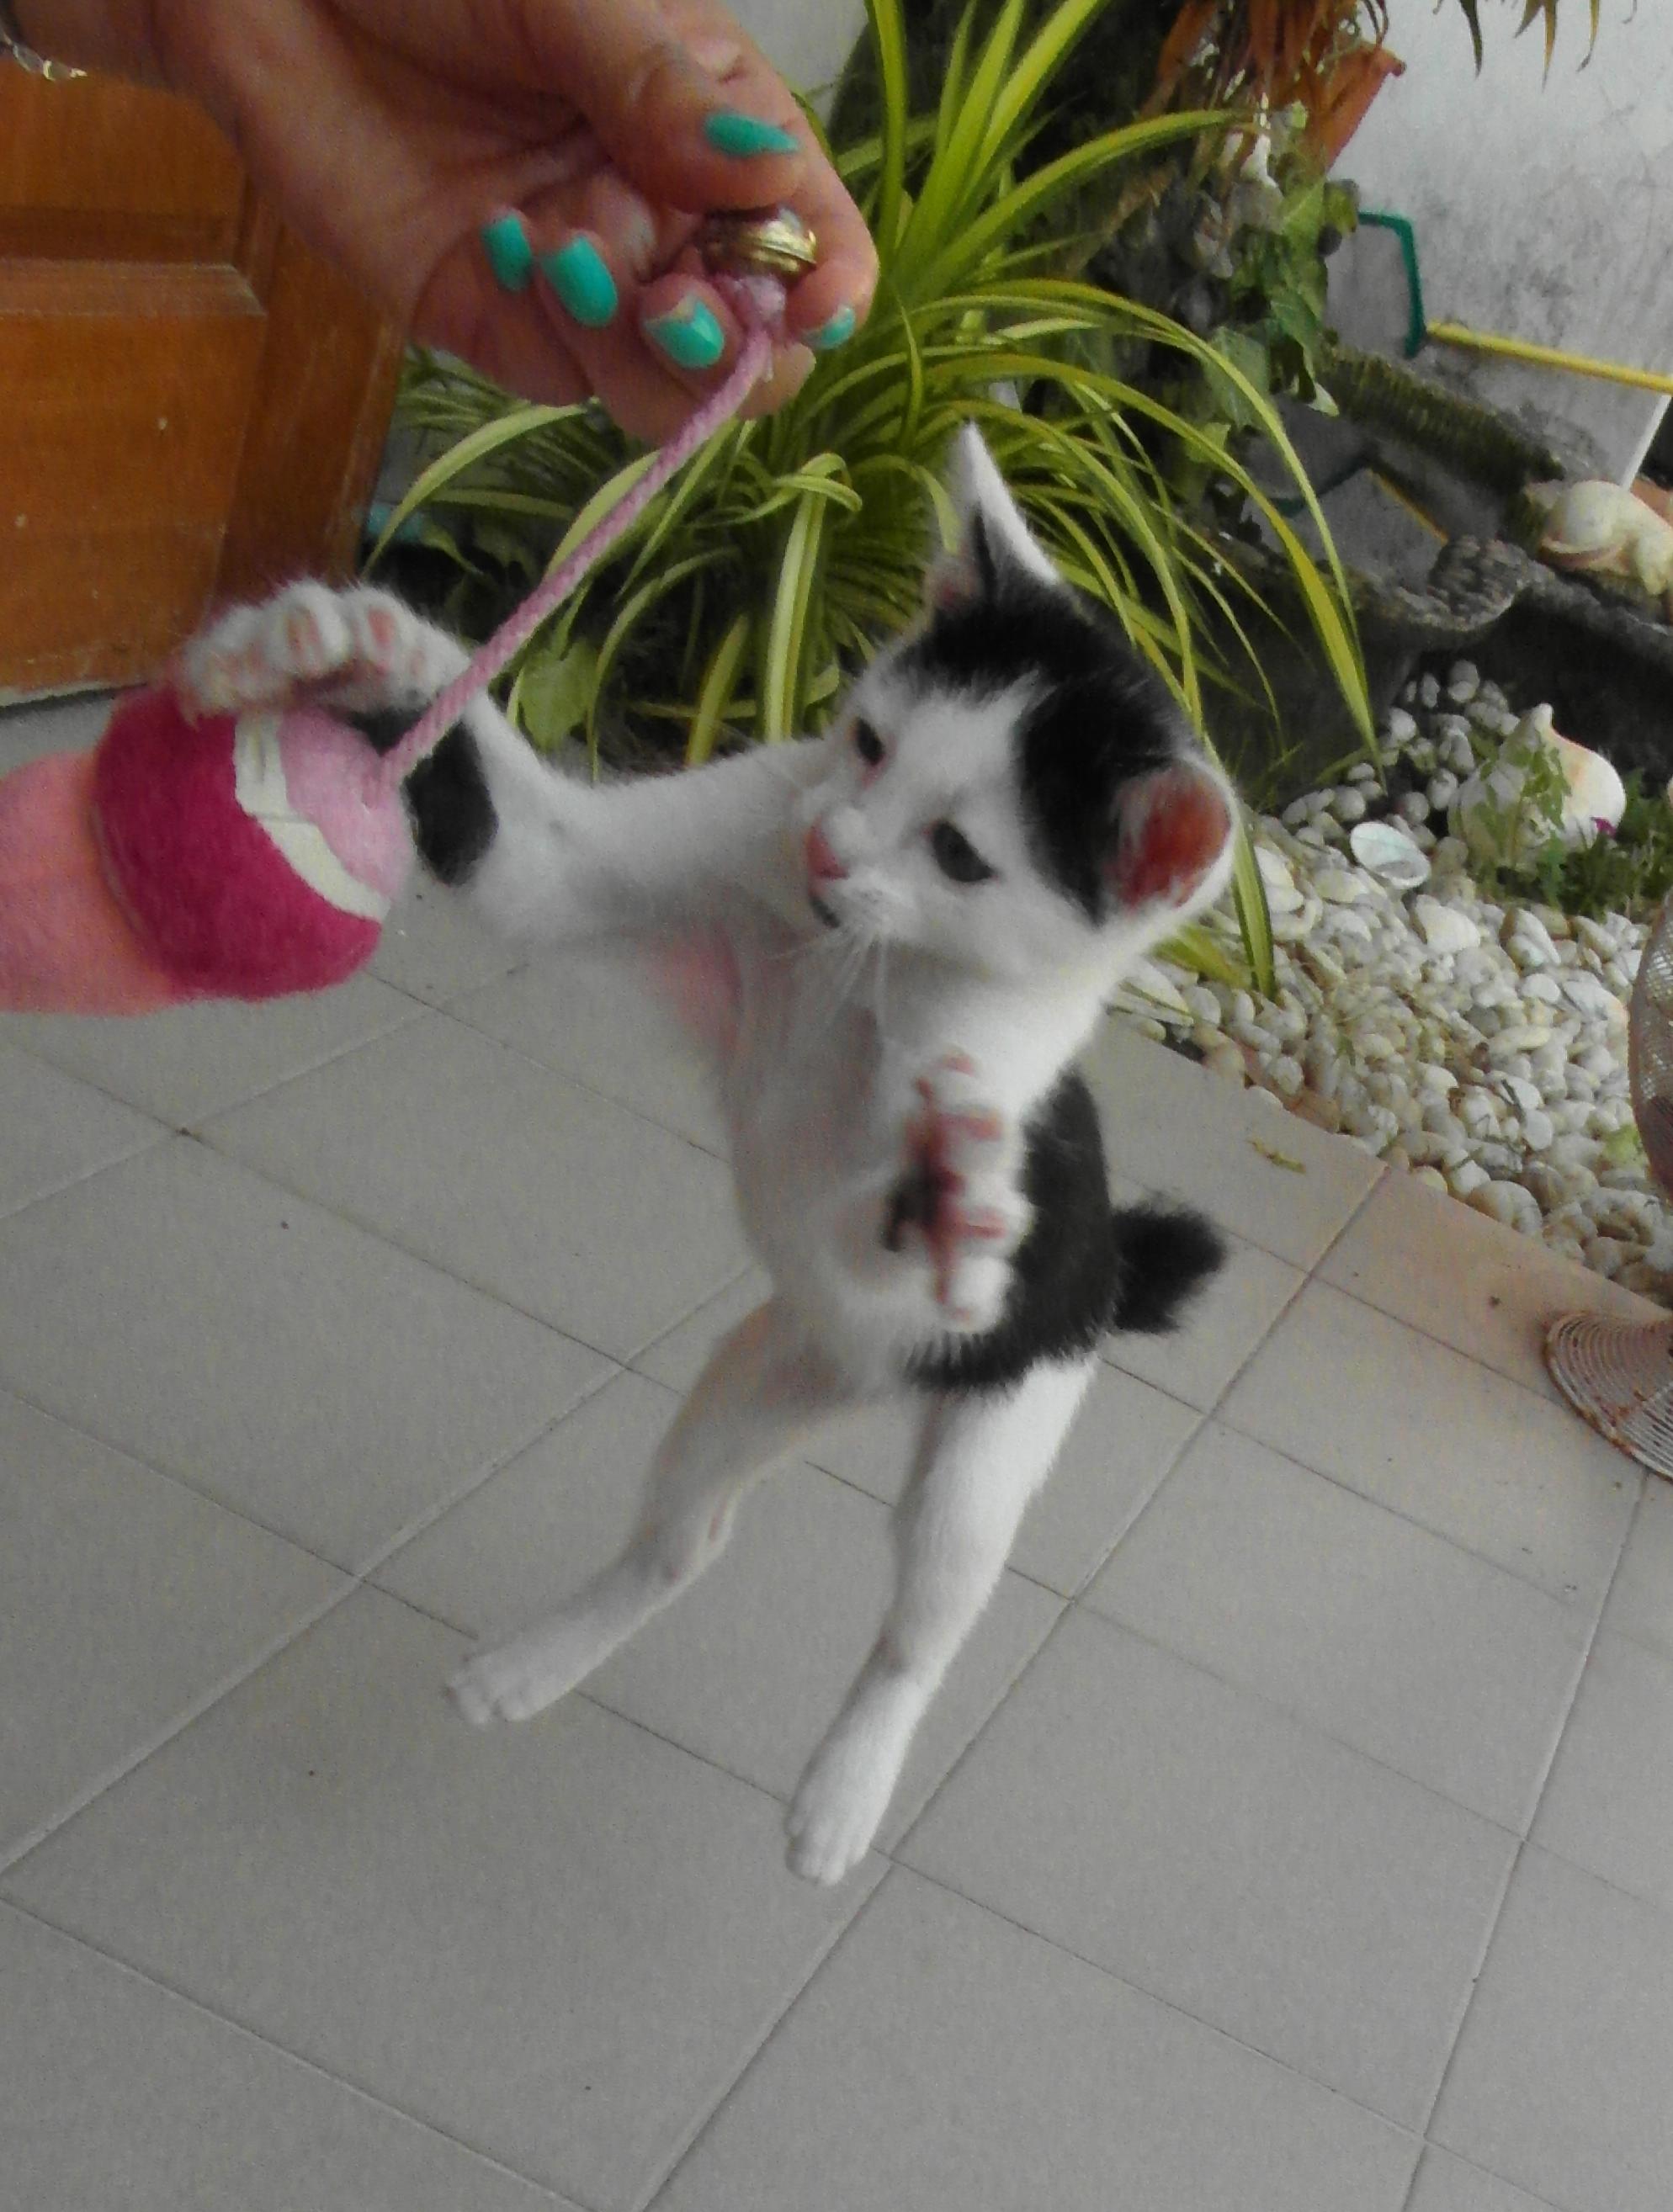 Jumping Kitten, Action, Cat, Jump, Jumping, HQ Photo